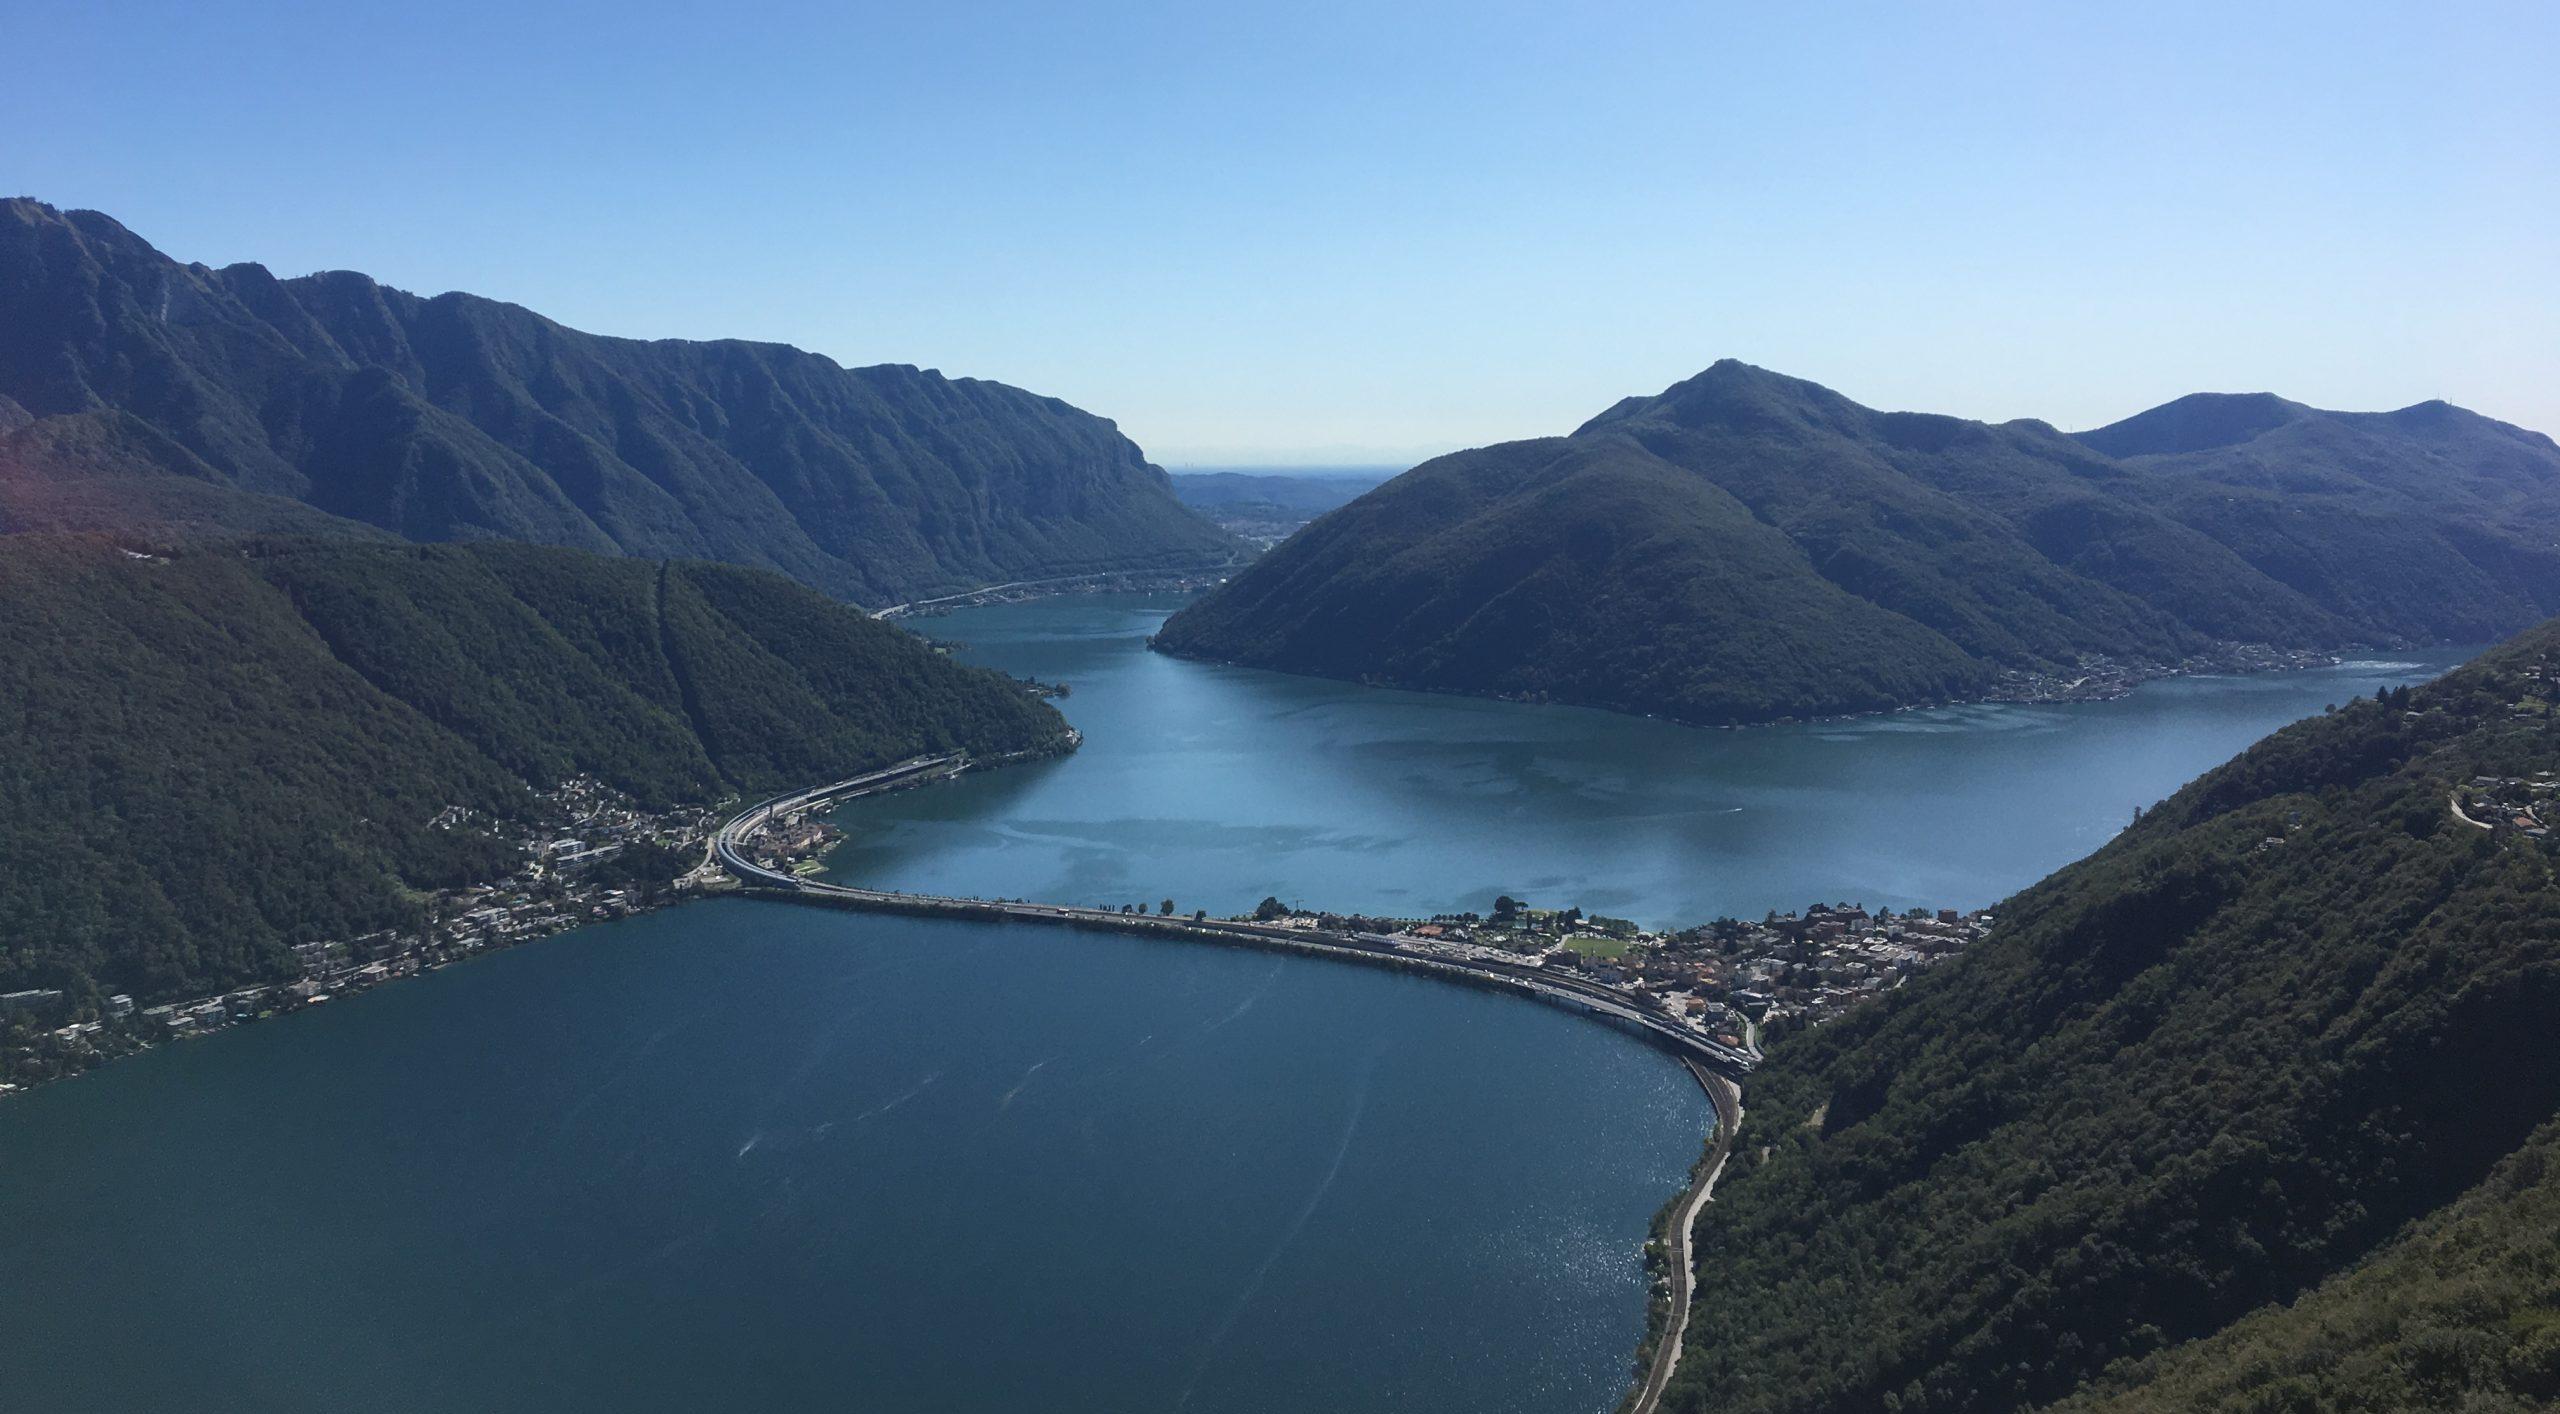 Lugano - Monte San Salvatore